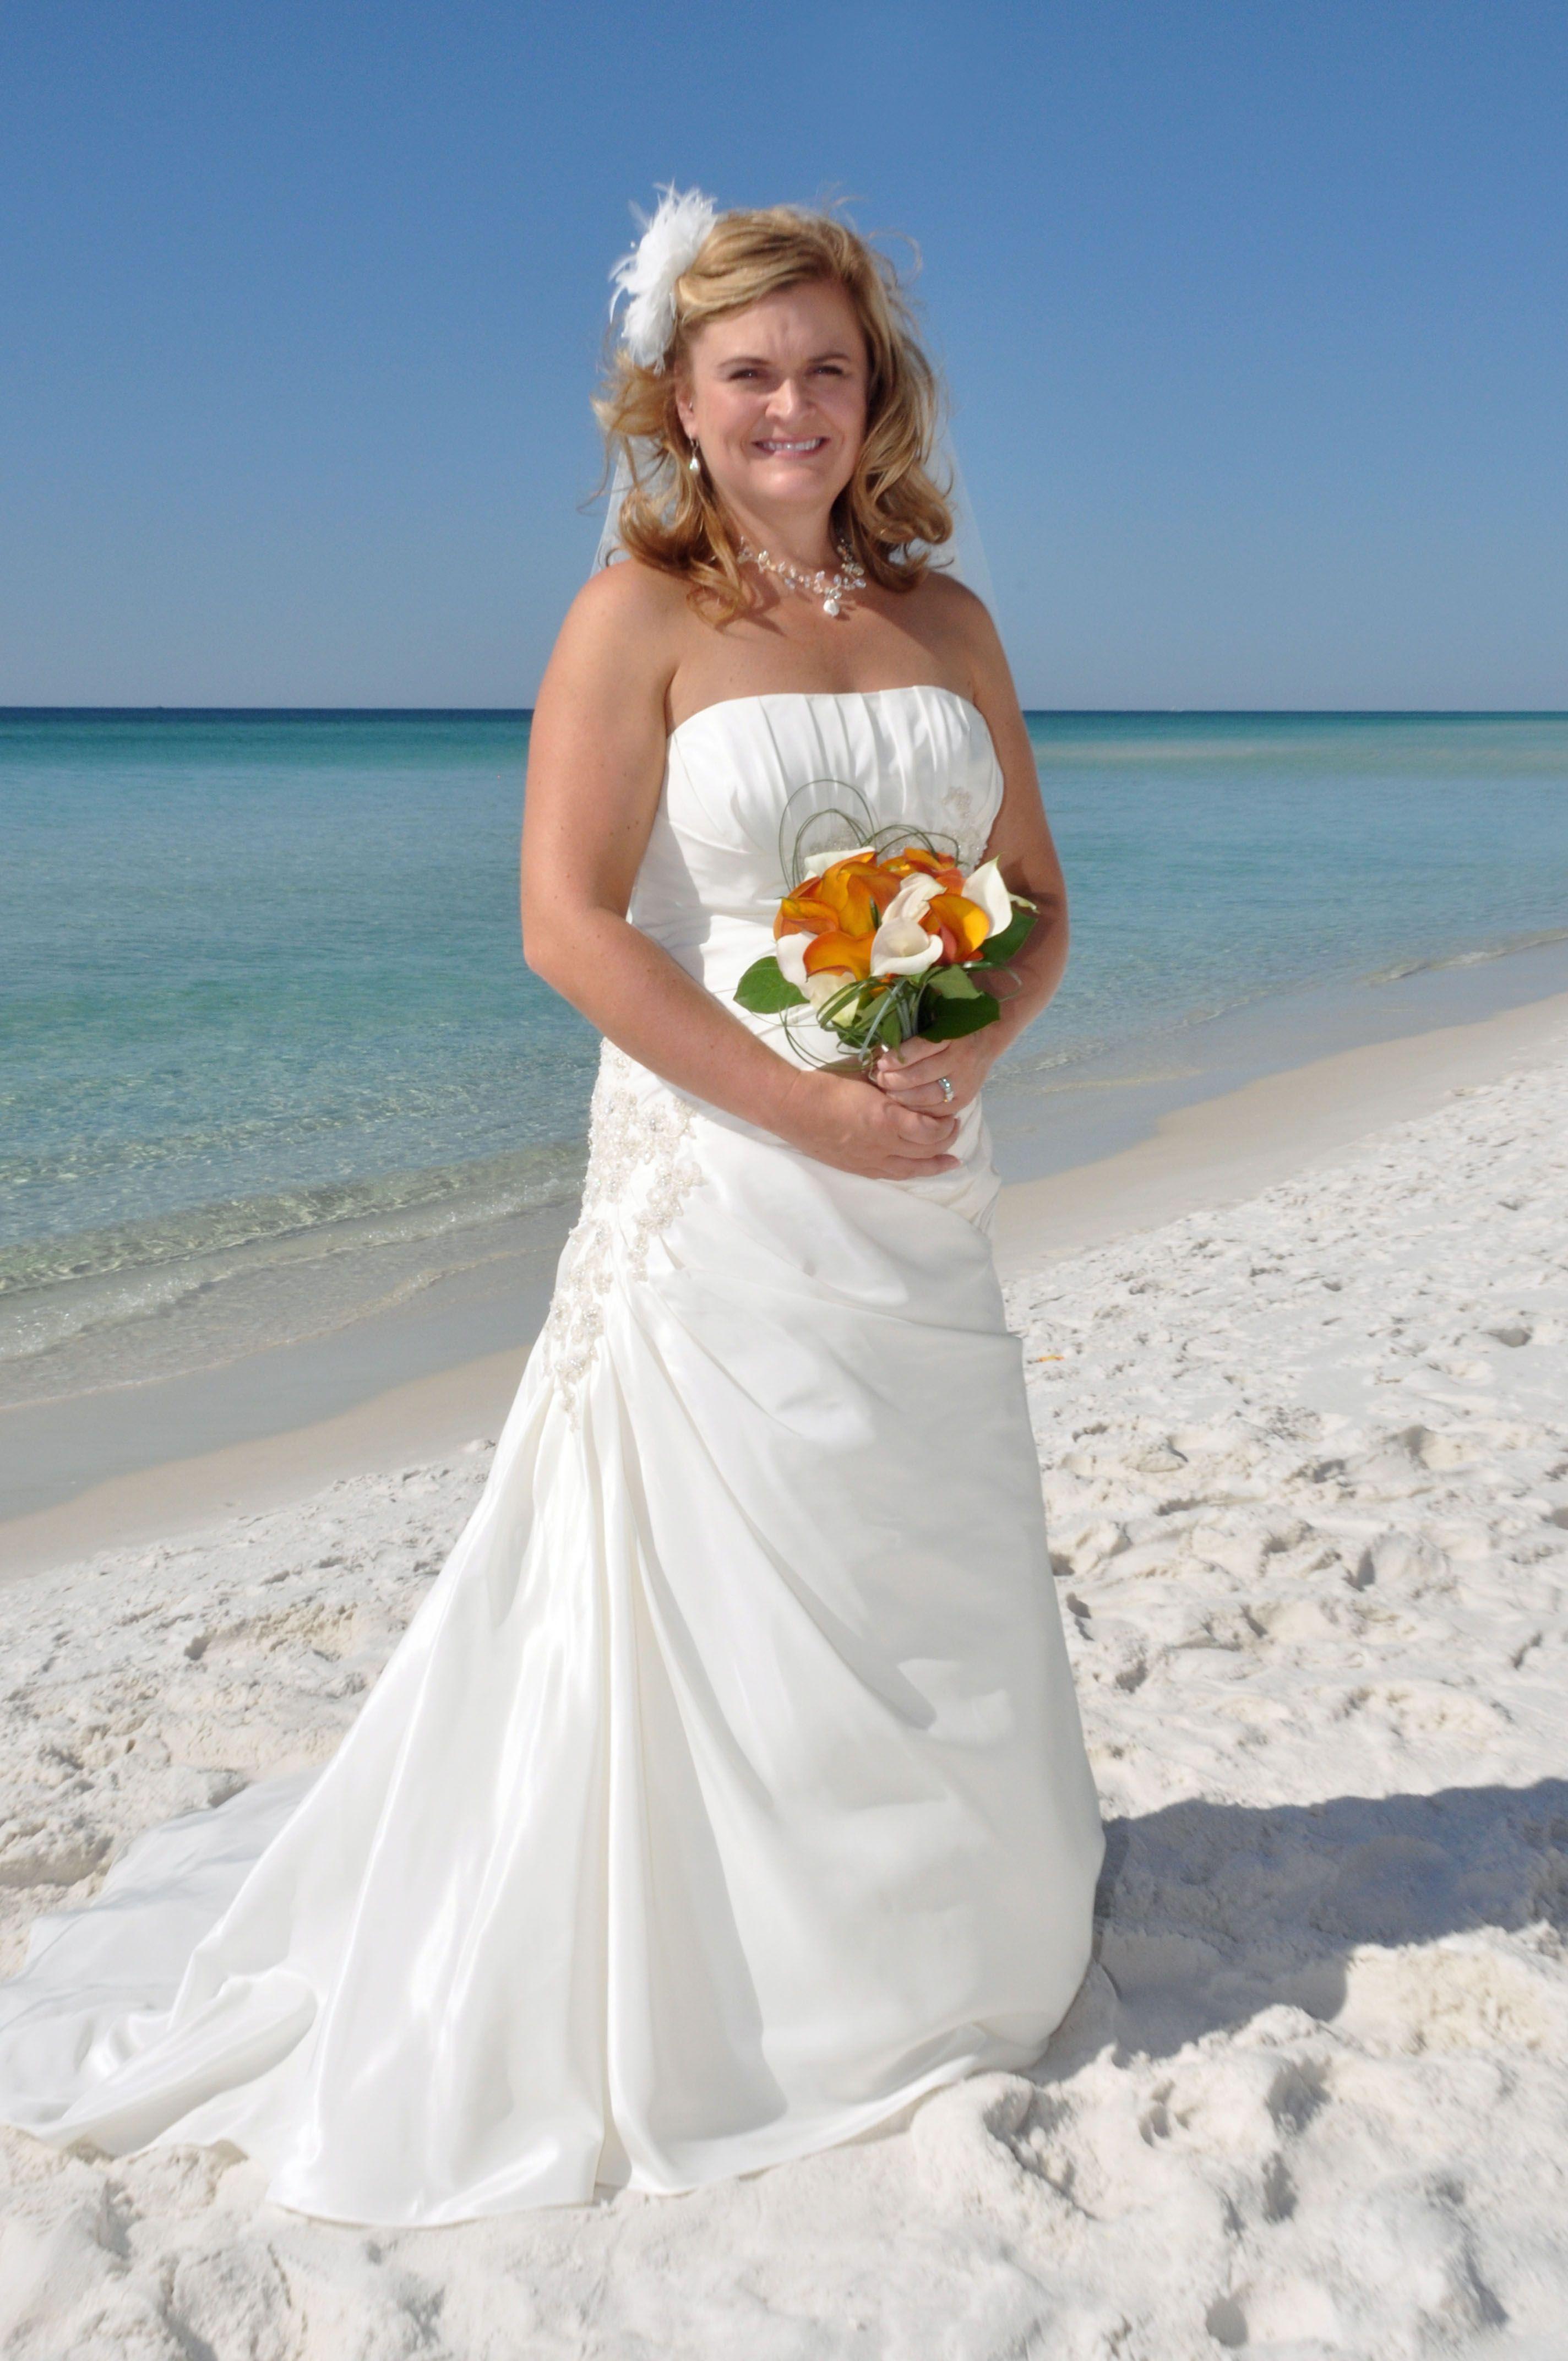 Morning wedding dresses  Morning wedding Destin FL October  photo by Sunset Beach